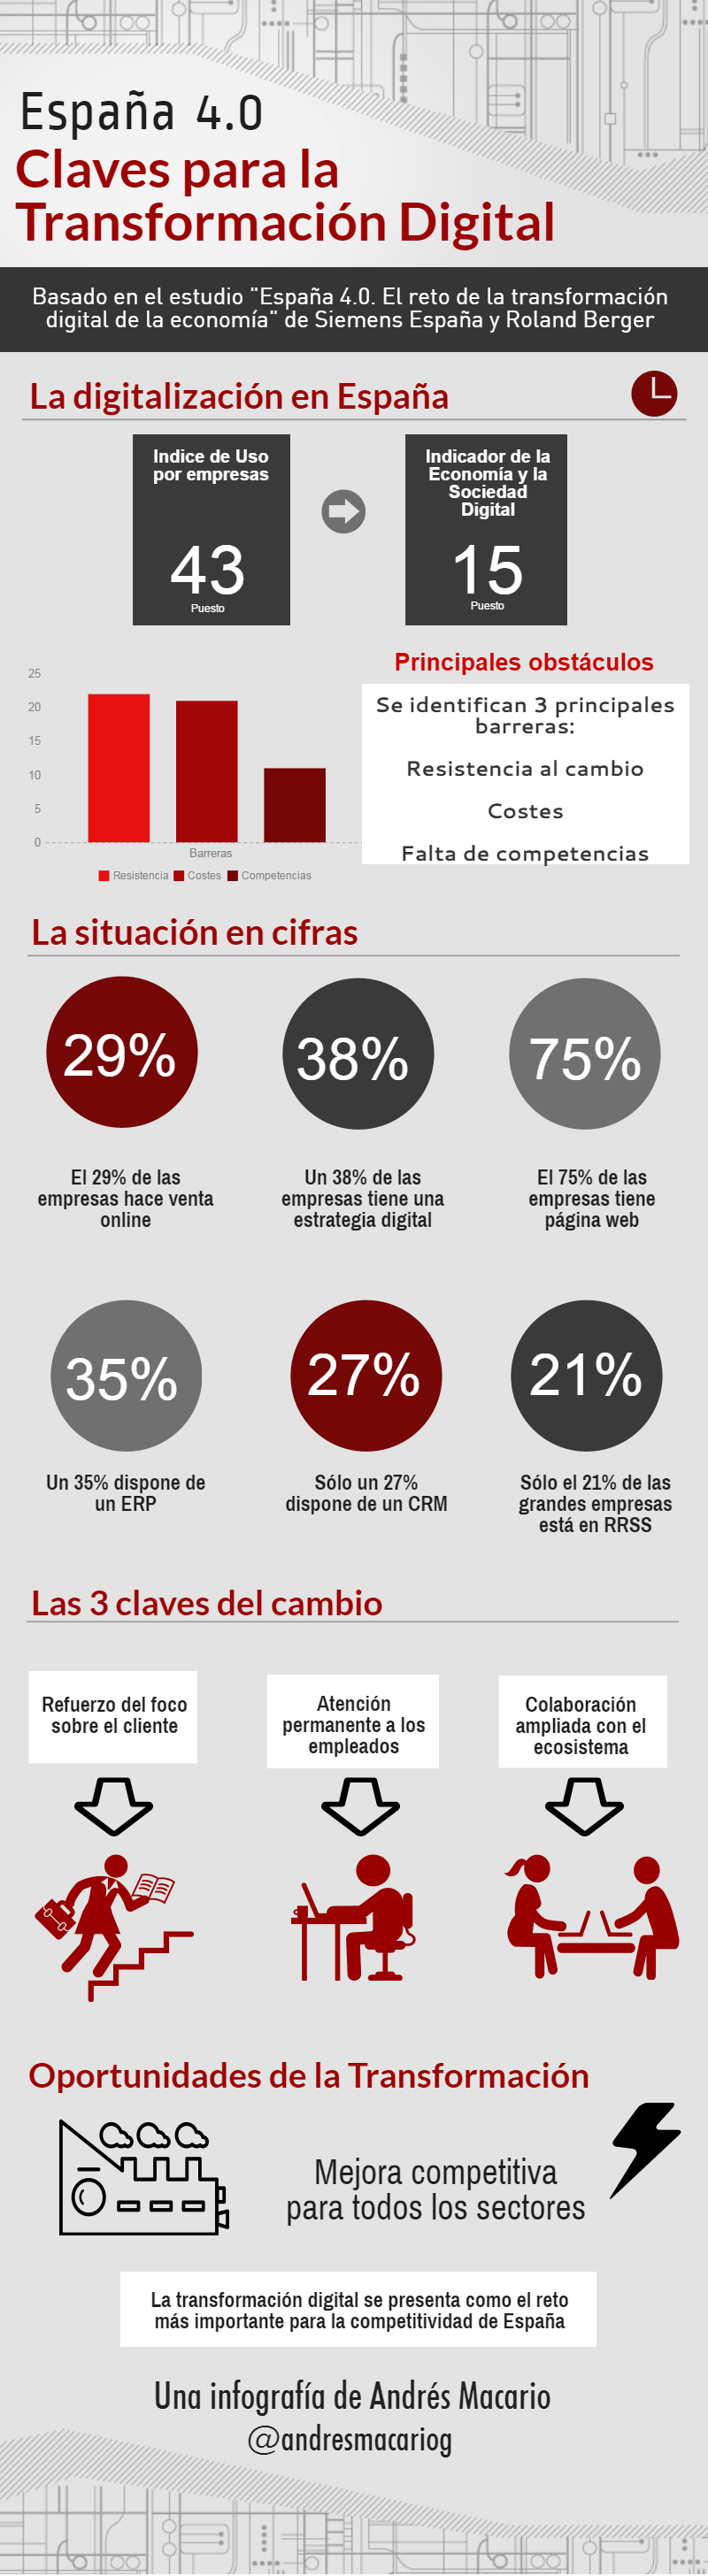 Espana 4.0 Claves para la Transformacion Digital Infografia Andres Macario